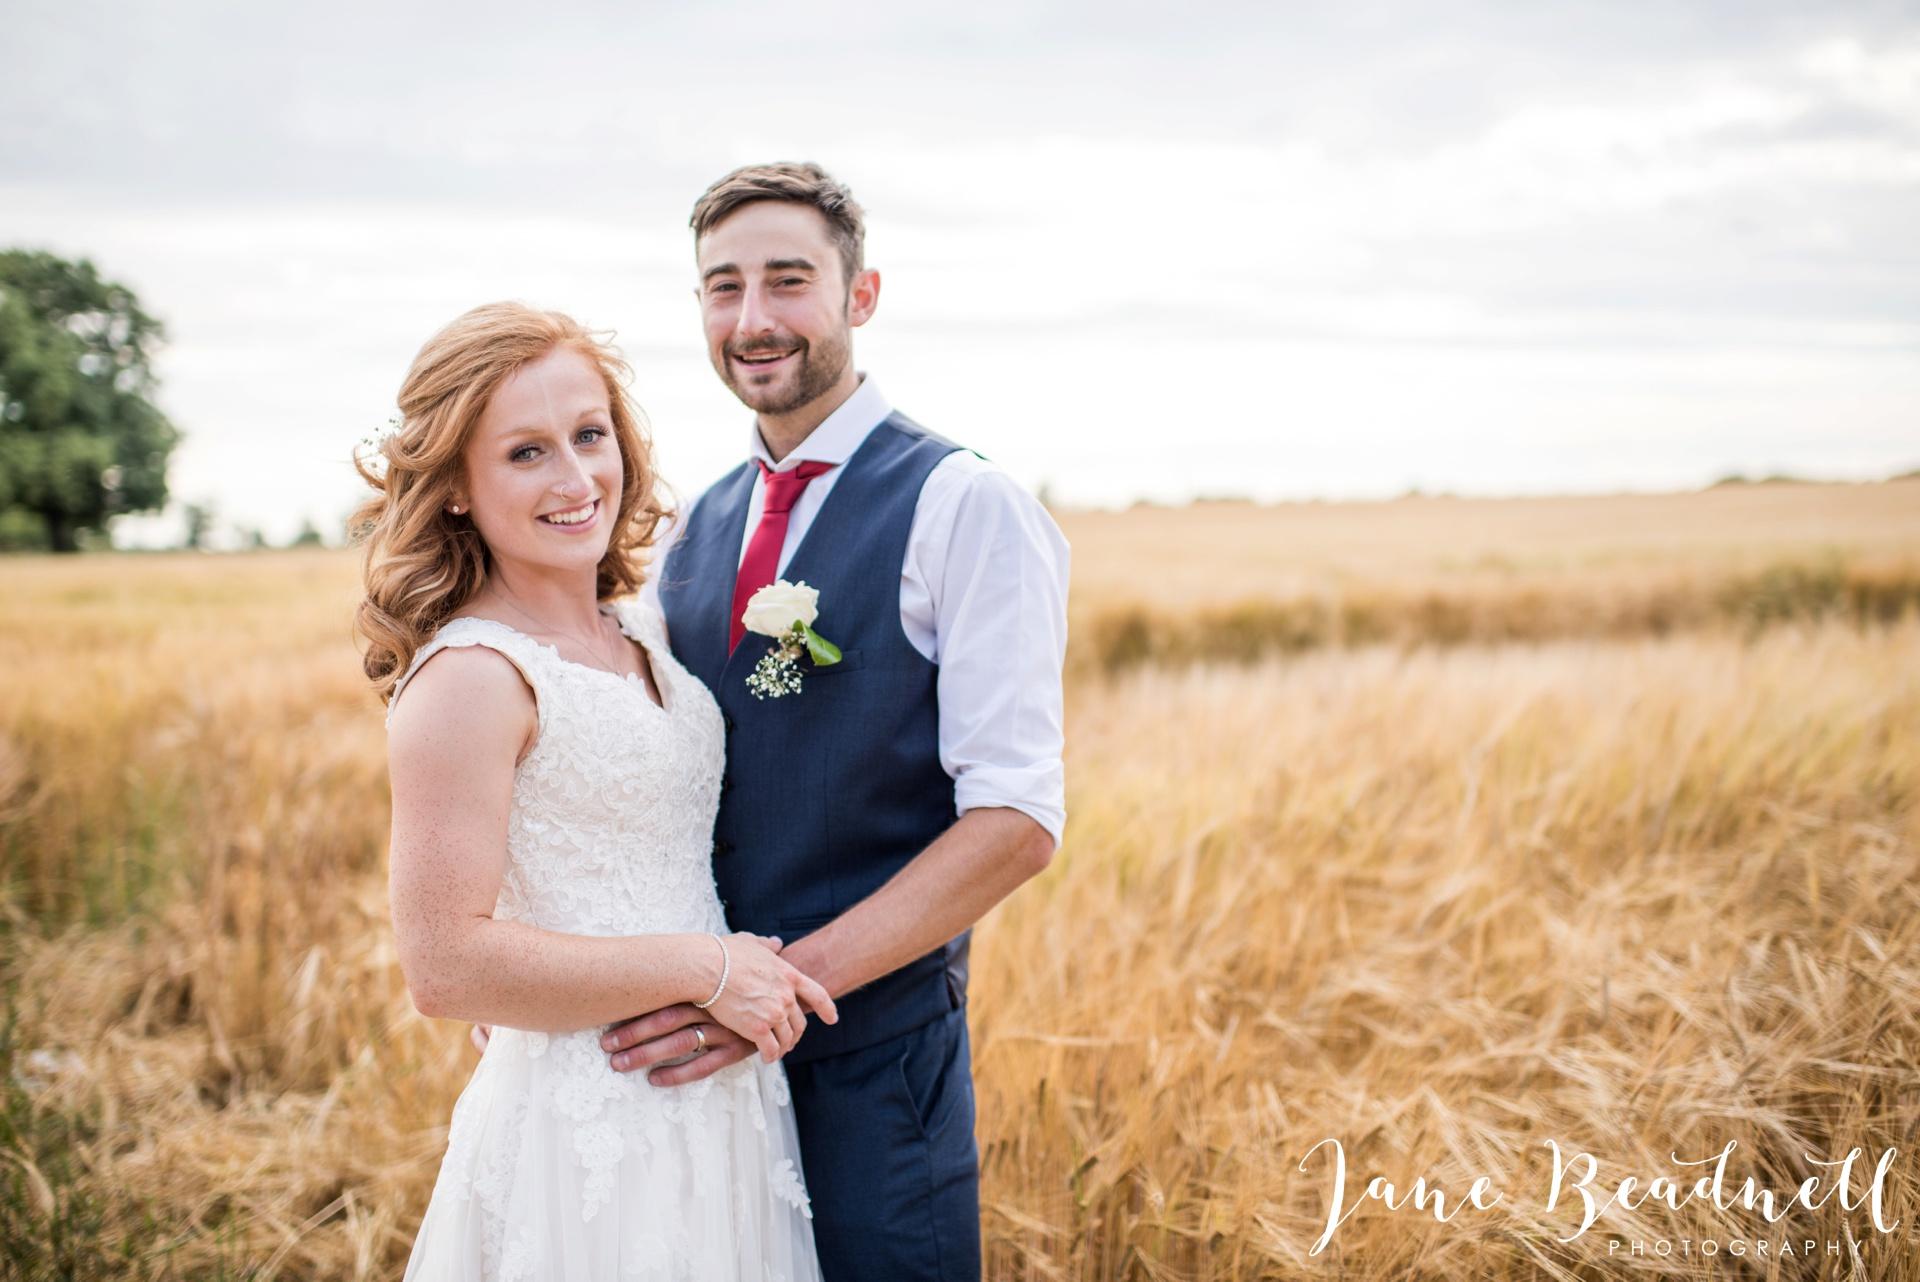 yorkshire-fine-art-wedding-photographer-jane-beadnell-photography-poppleton-york_0128